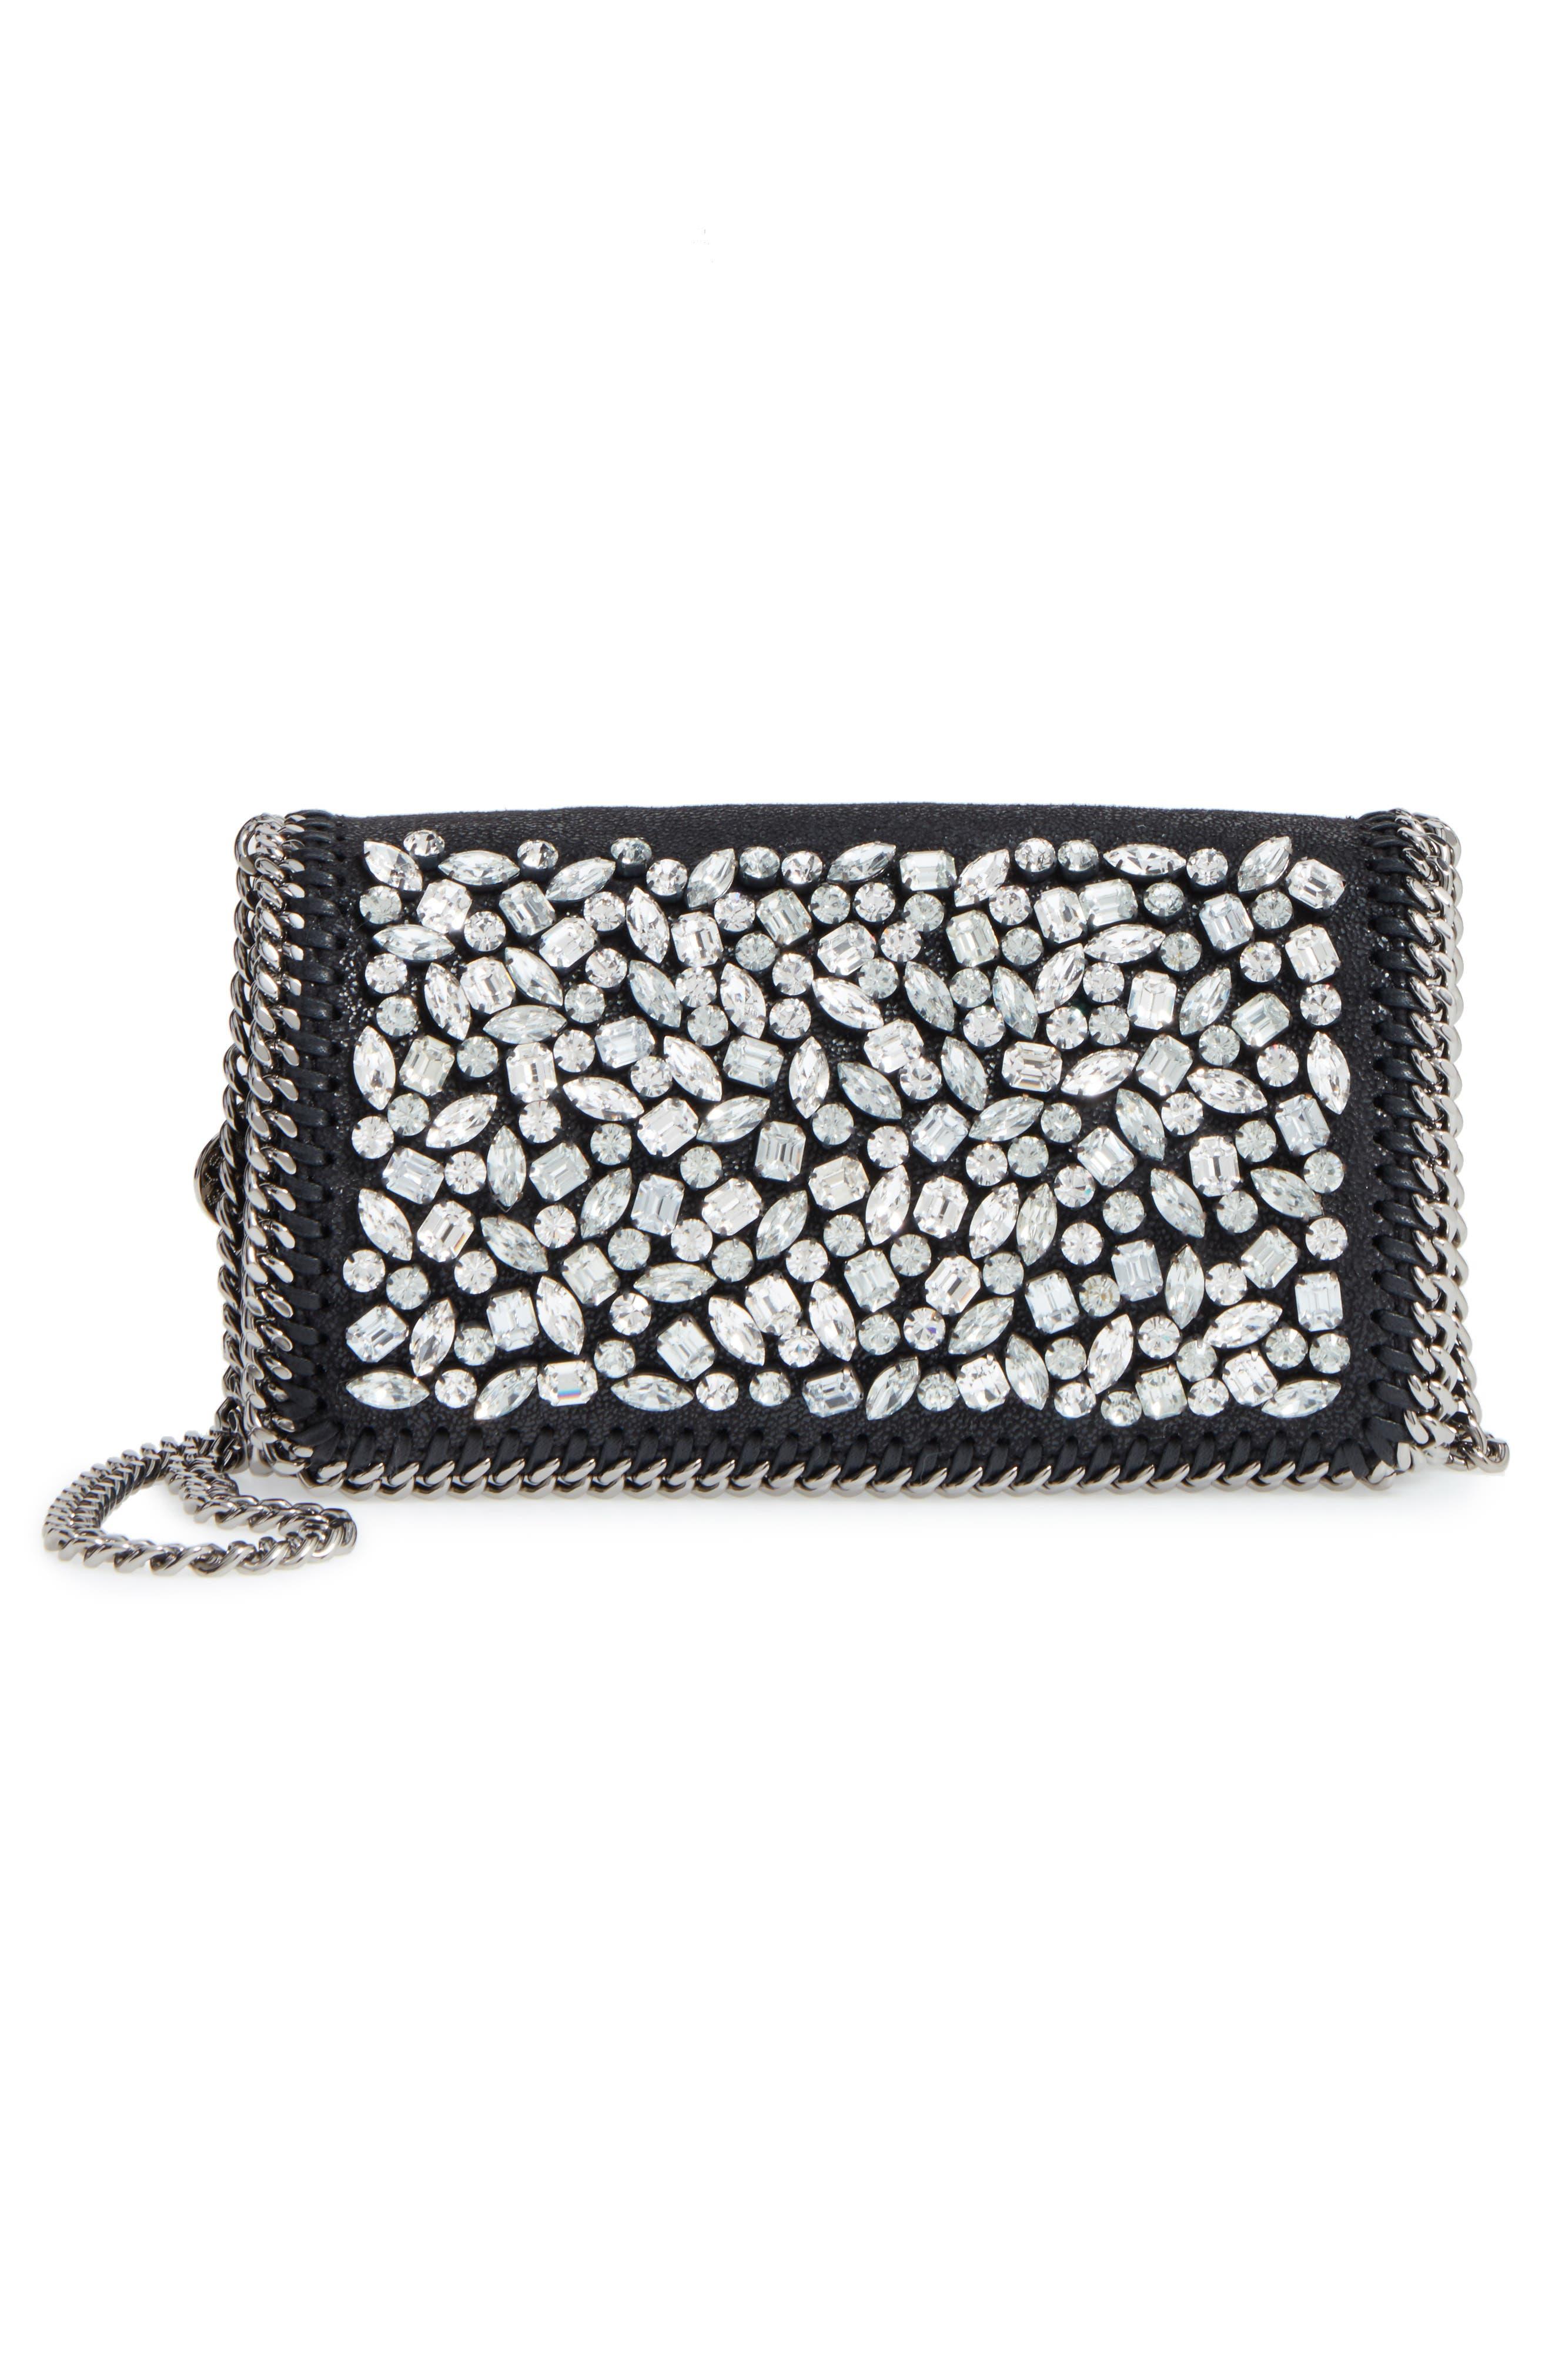 Alternate Image 1 Selected - Stella McCartney Small Fallabella Crystal Faux Leather Crossbody Bag